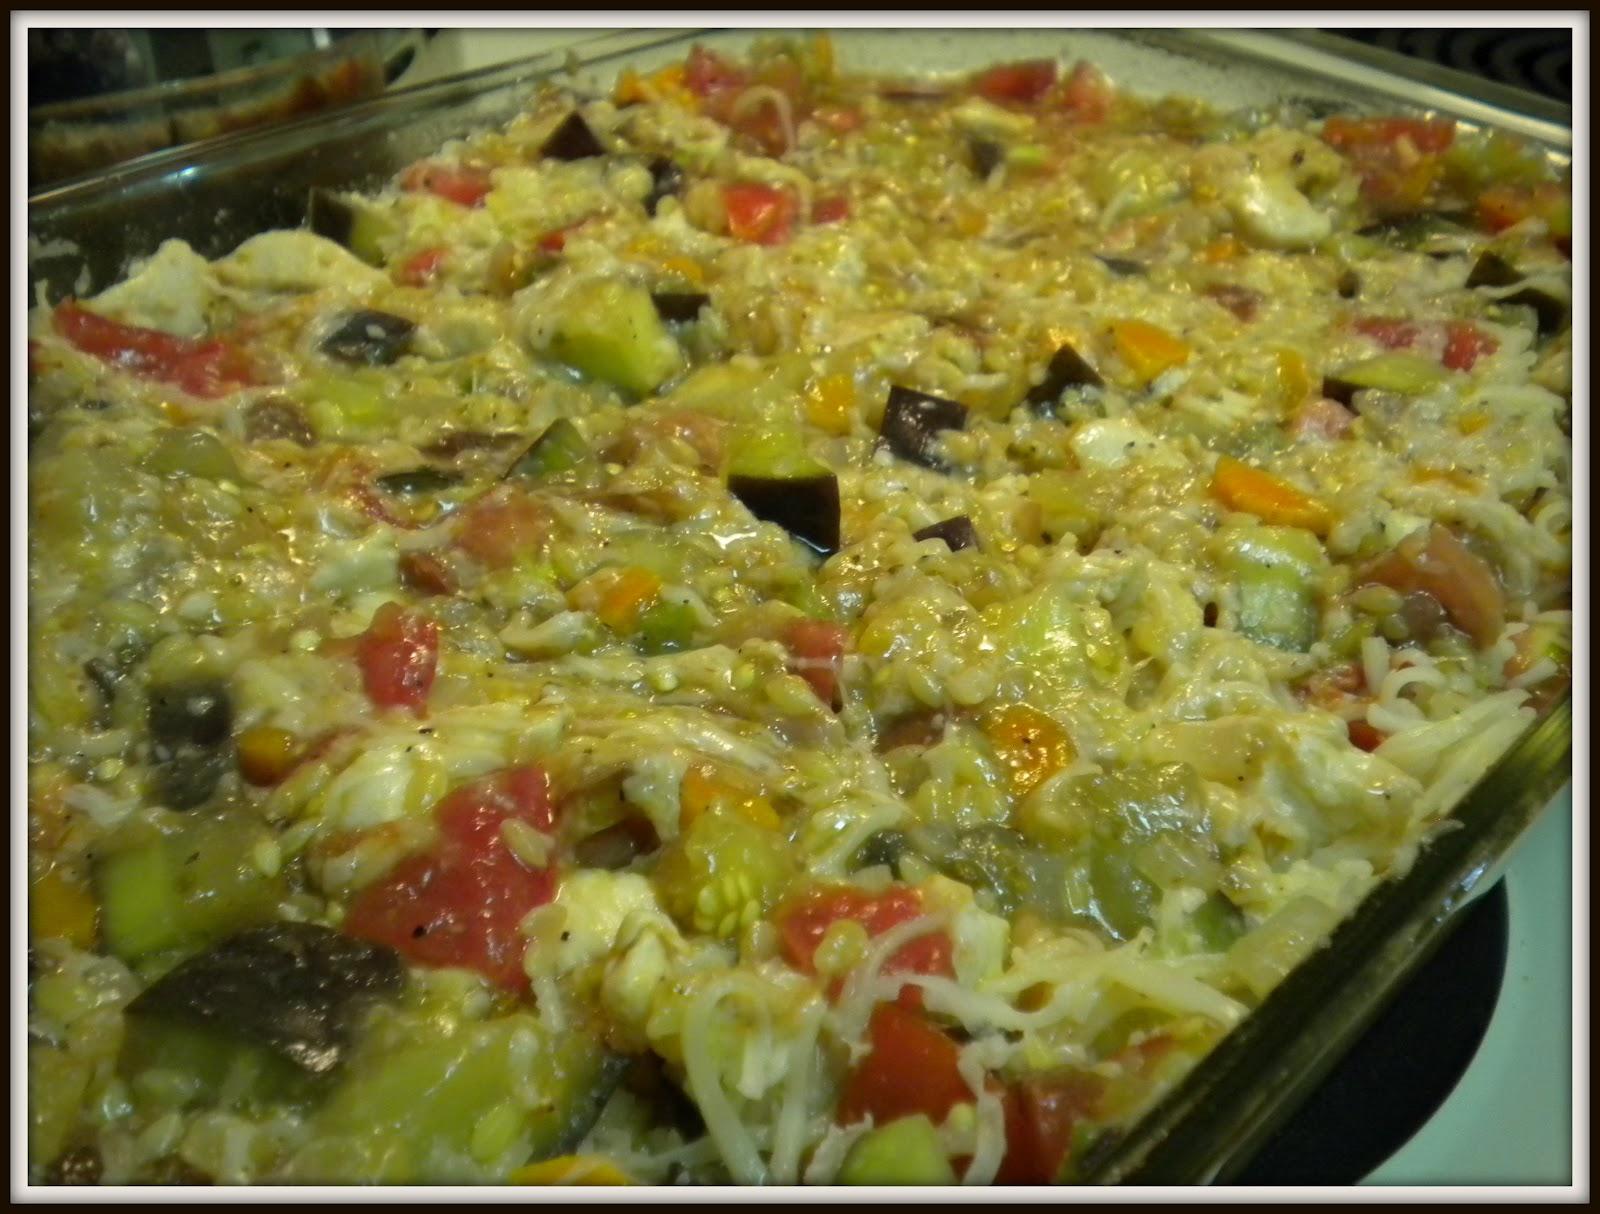 girl eats world: Baked Orzo with Eggplant and Mozzarella